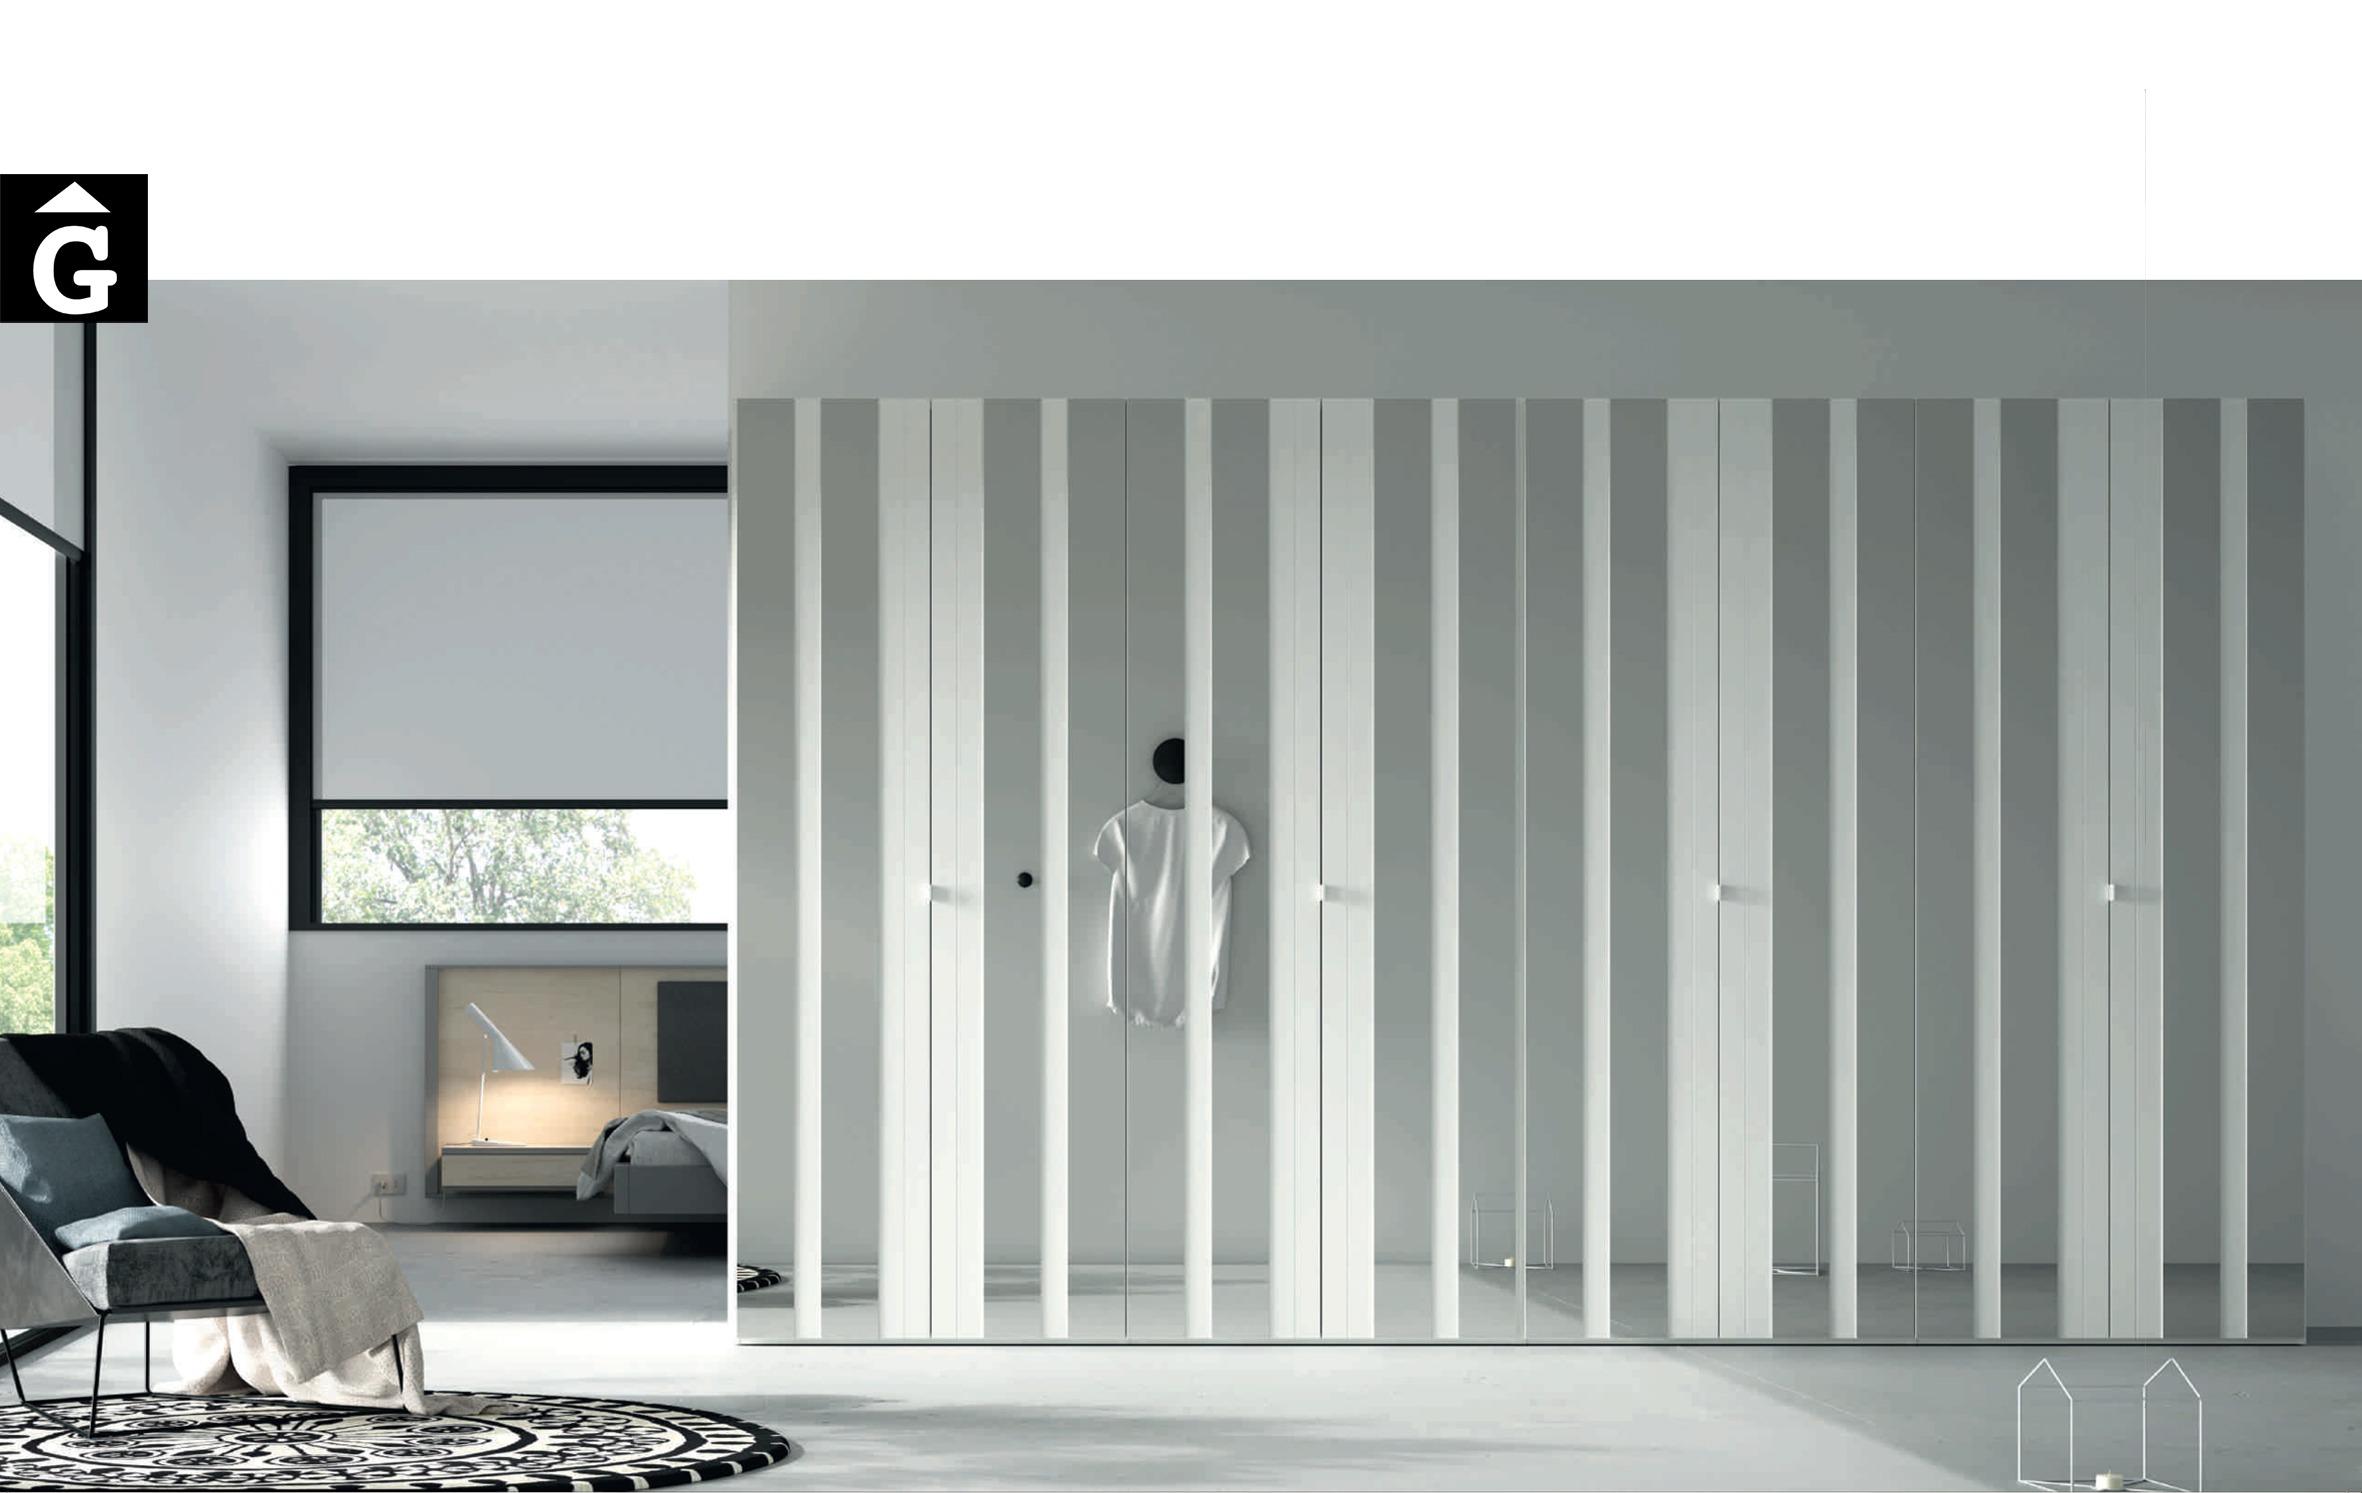 Lagrama armaris AV mirall tot by Mobles GIFREU Girona modern qualitat vanguardia minim elegant atemporal